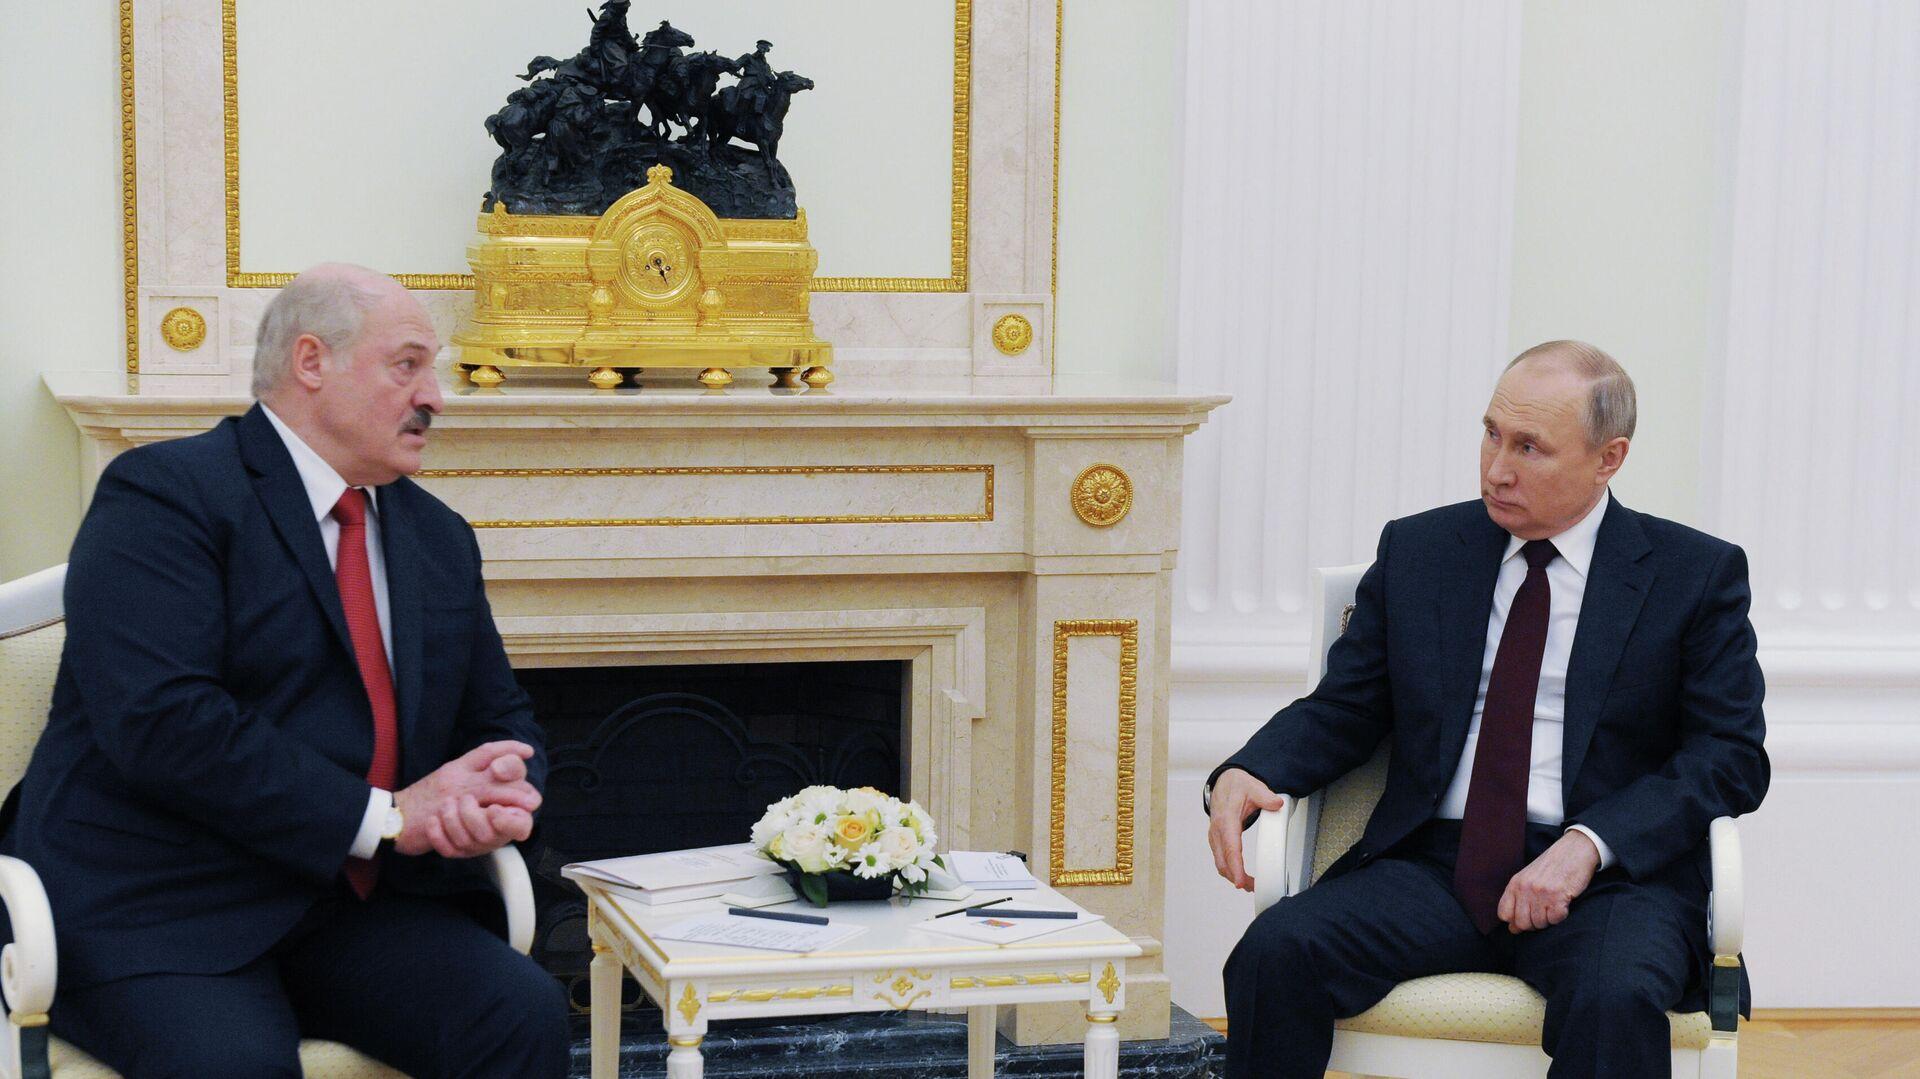 El presidente de Bielorrusia, Alexandr Lukashenko, y el presidente ruso, Vladímir Putin - Sputnik Mundo, 1920, 22.04.2021